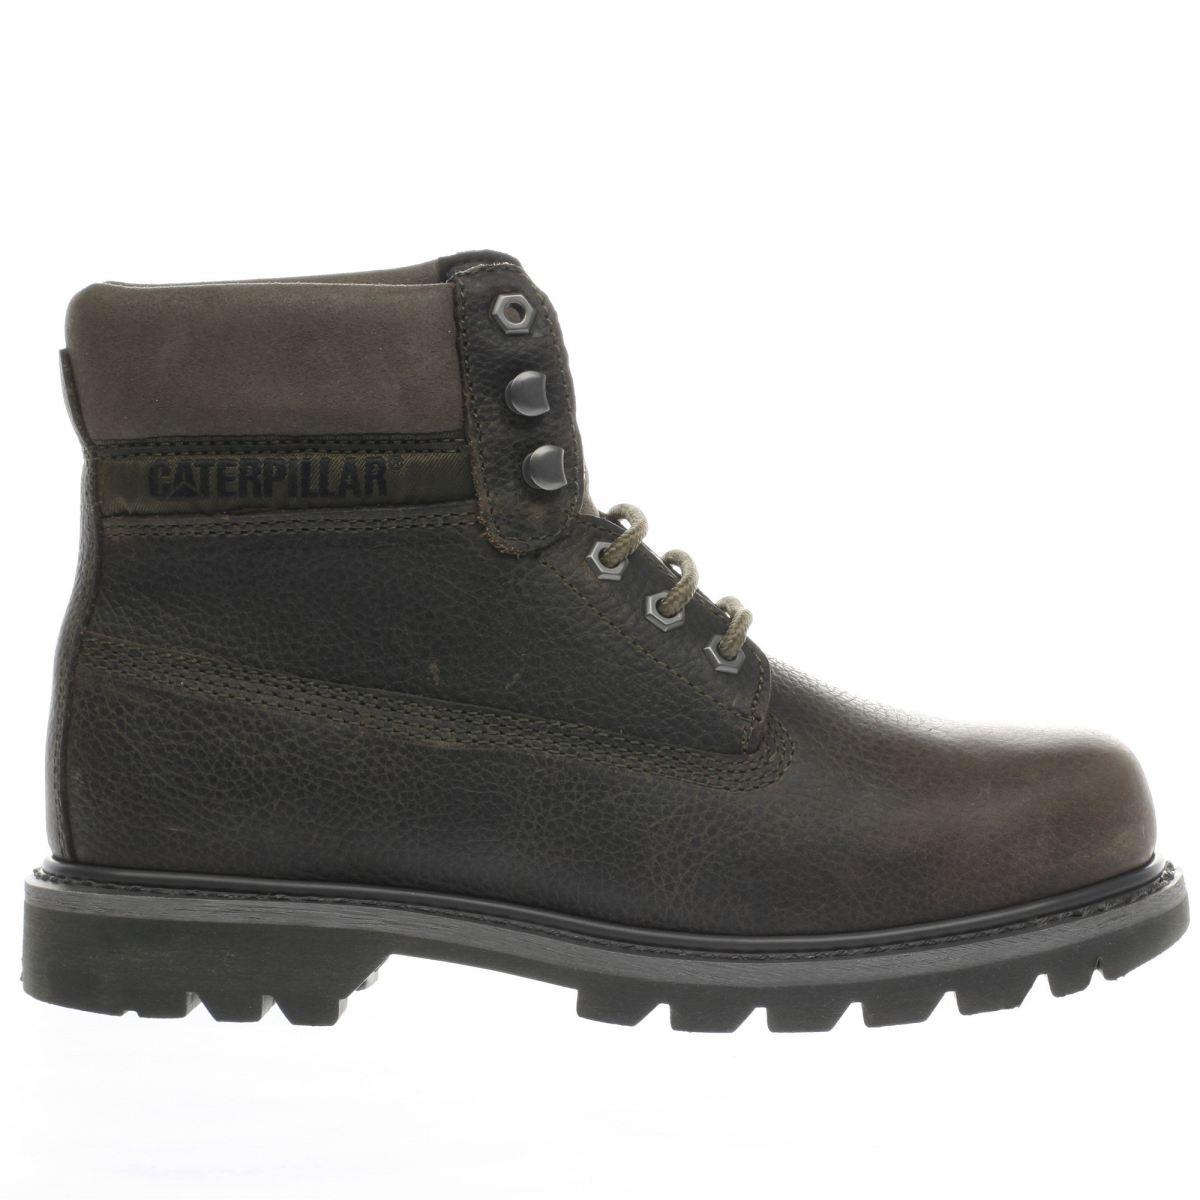 cat-footwear khaki colorado boots